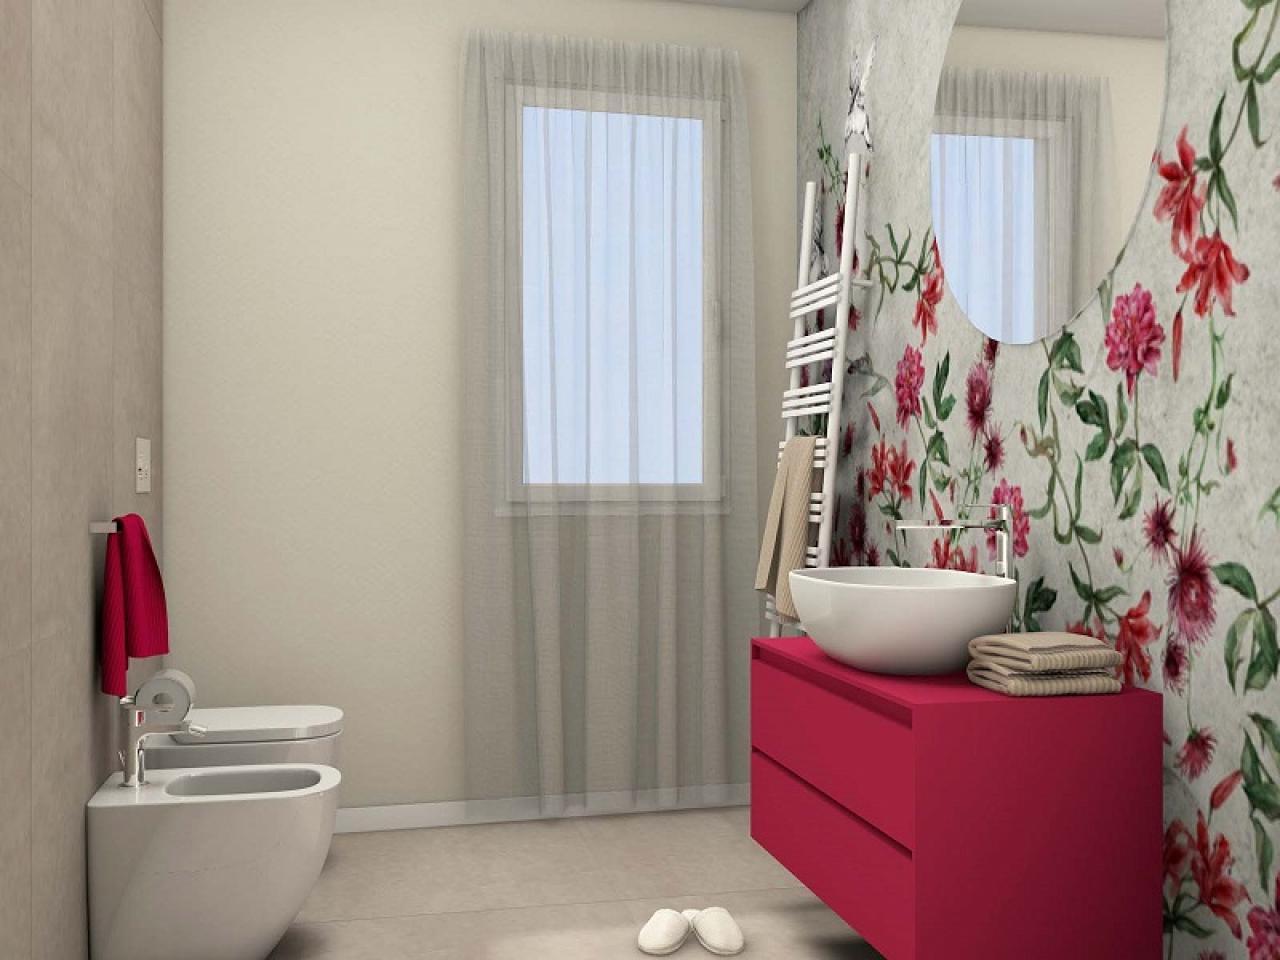 Foto Bagni Moderni Colorati.Bagni Moderni Progetti Di Annalisa Fratelli Pellizzari